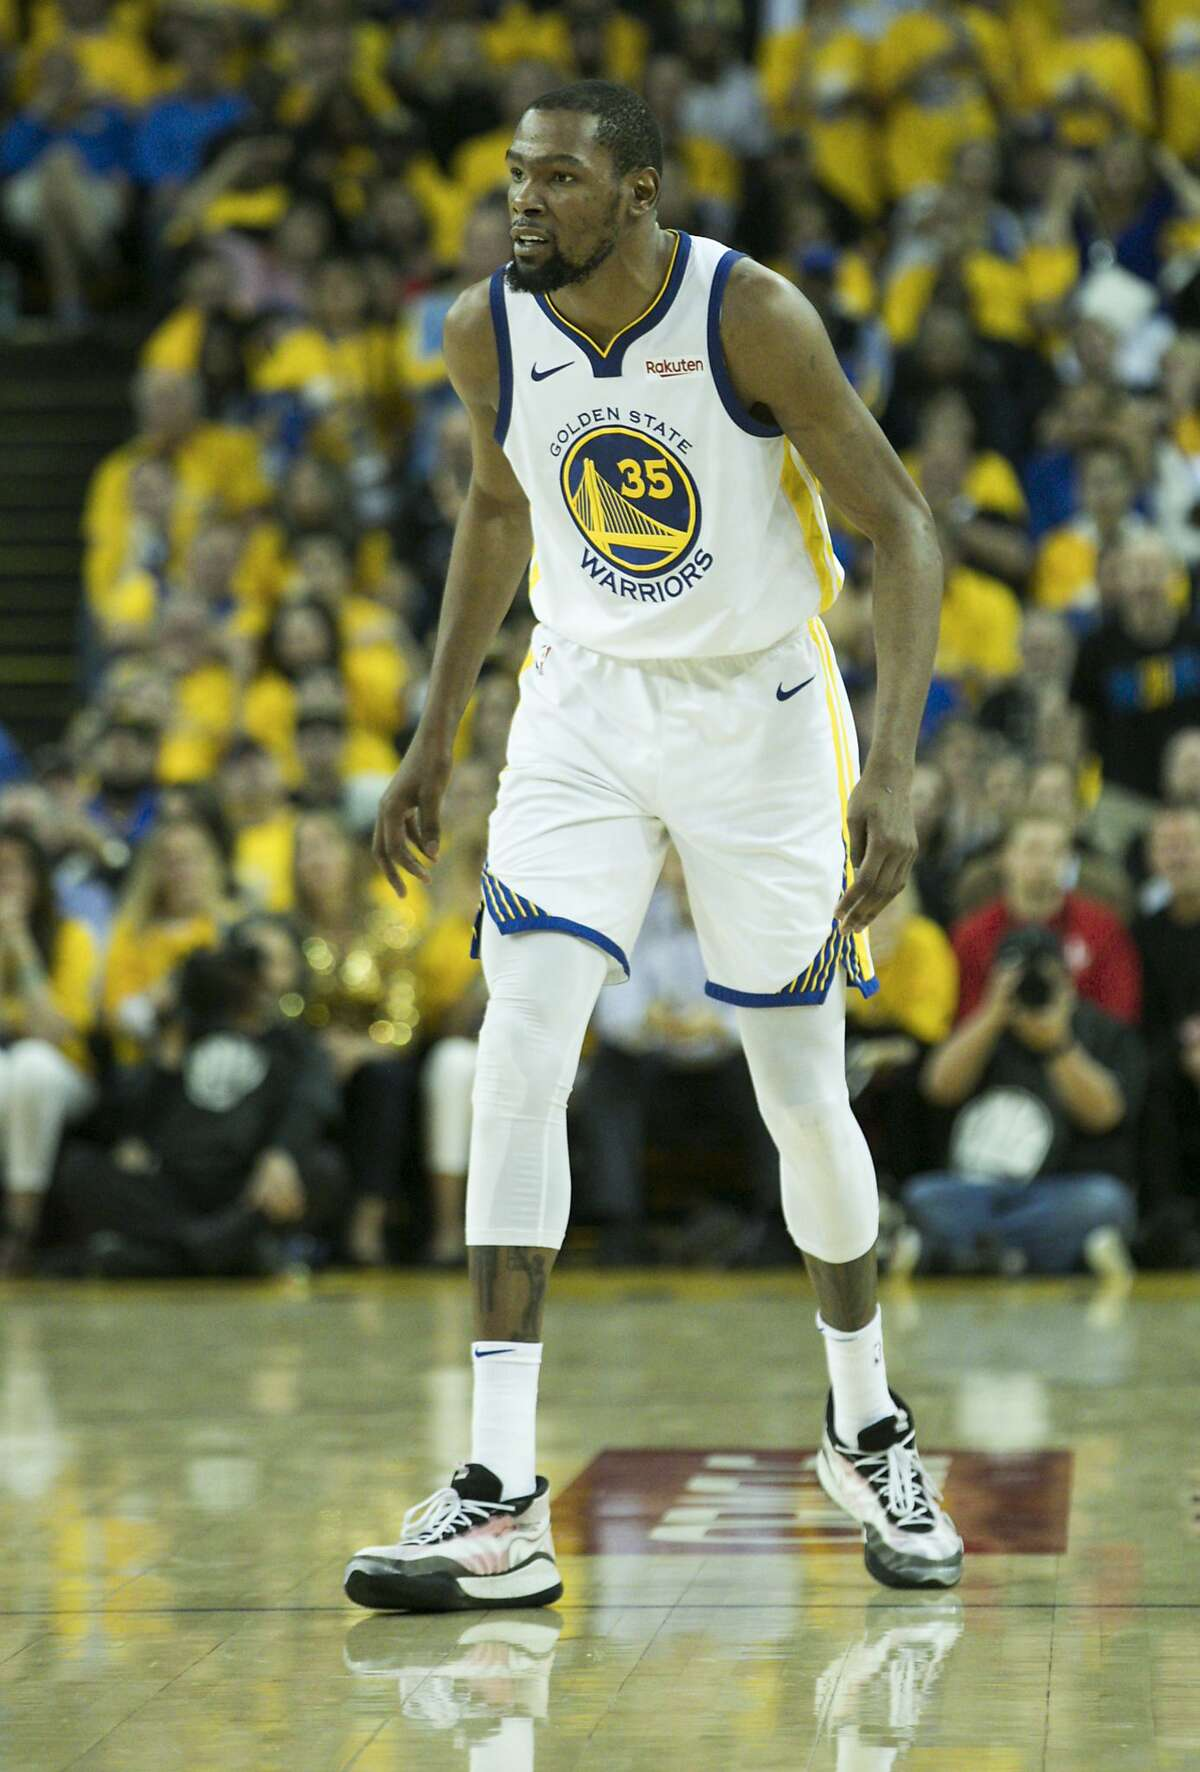 10. Kevin Durant Sport: Basketball Salary: $30.4 million Endorsements: $35 million Total earnings: $65.4 million